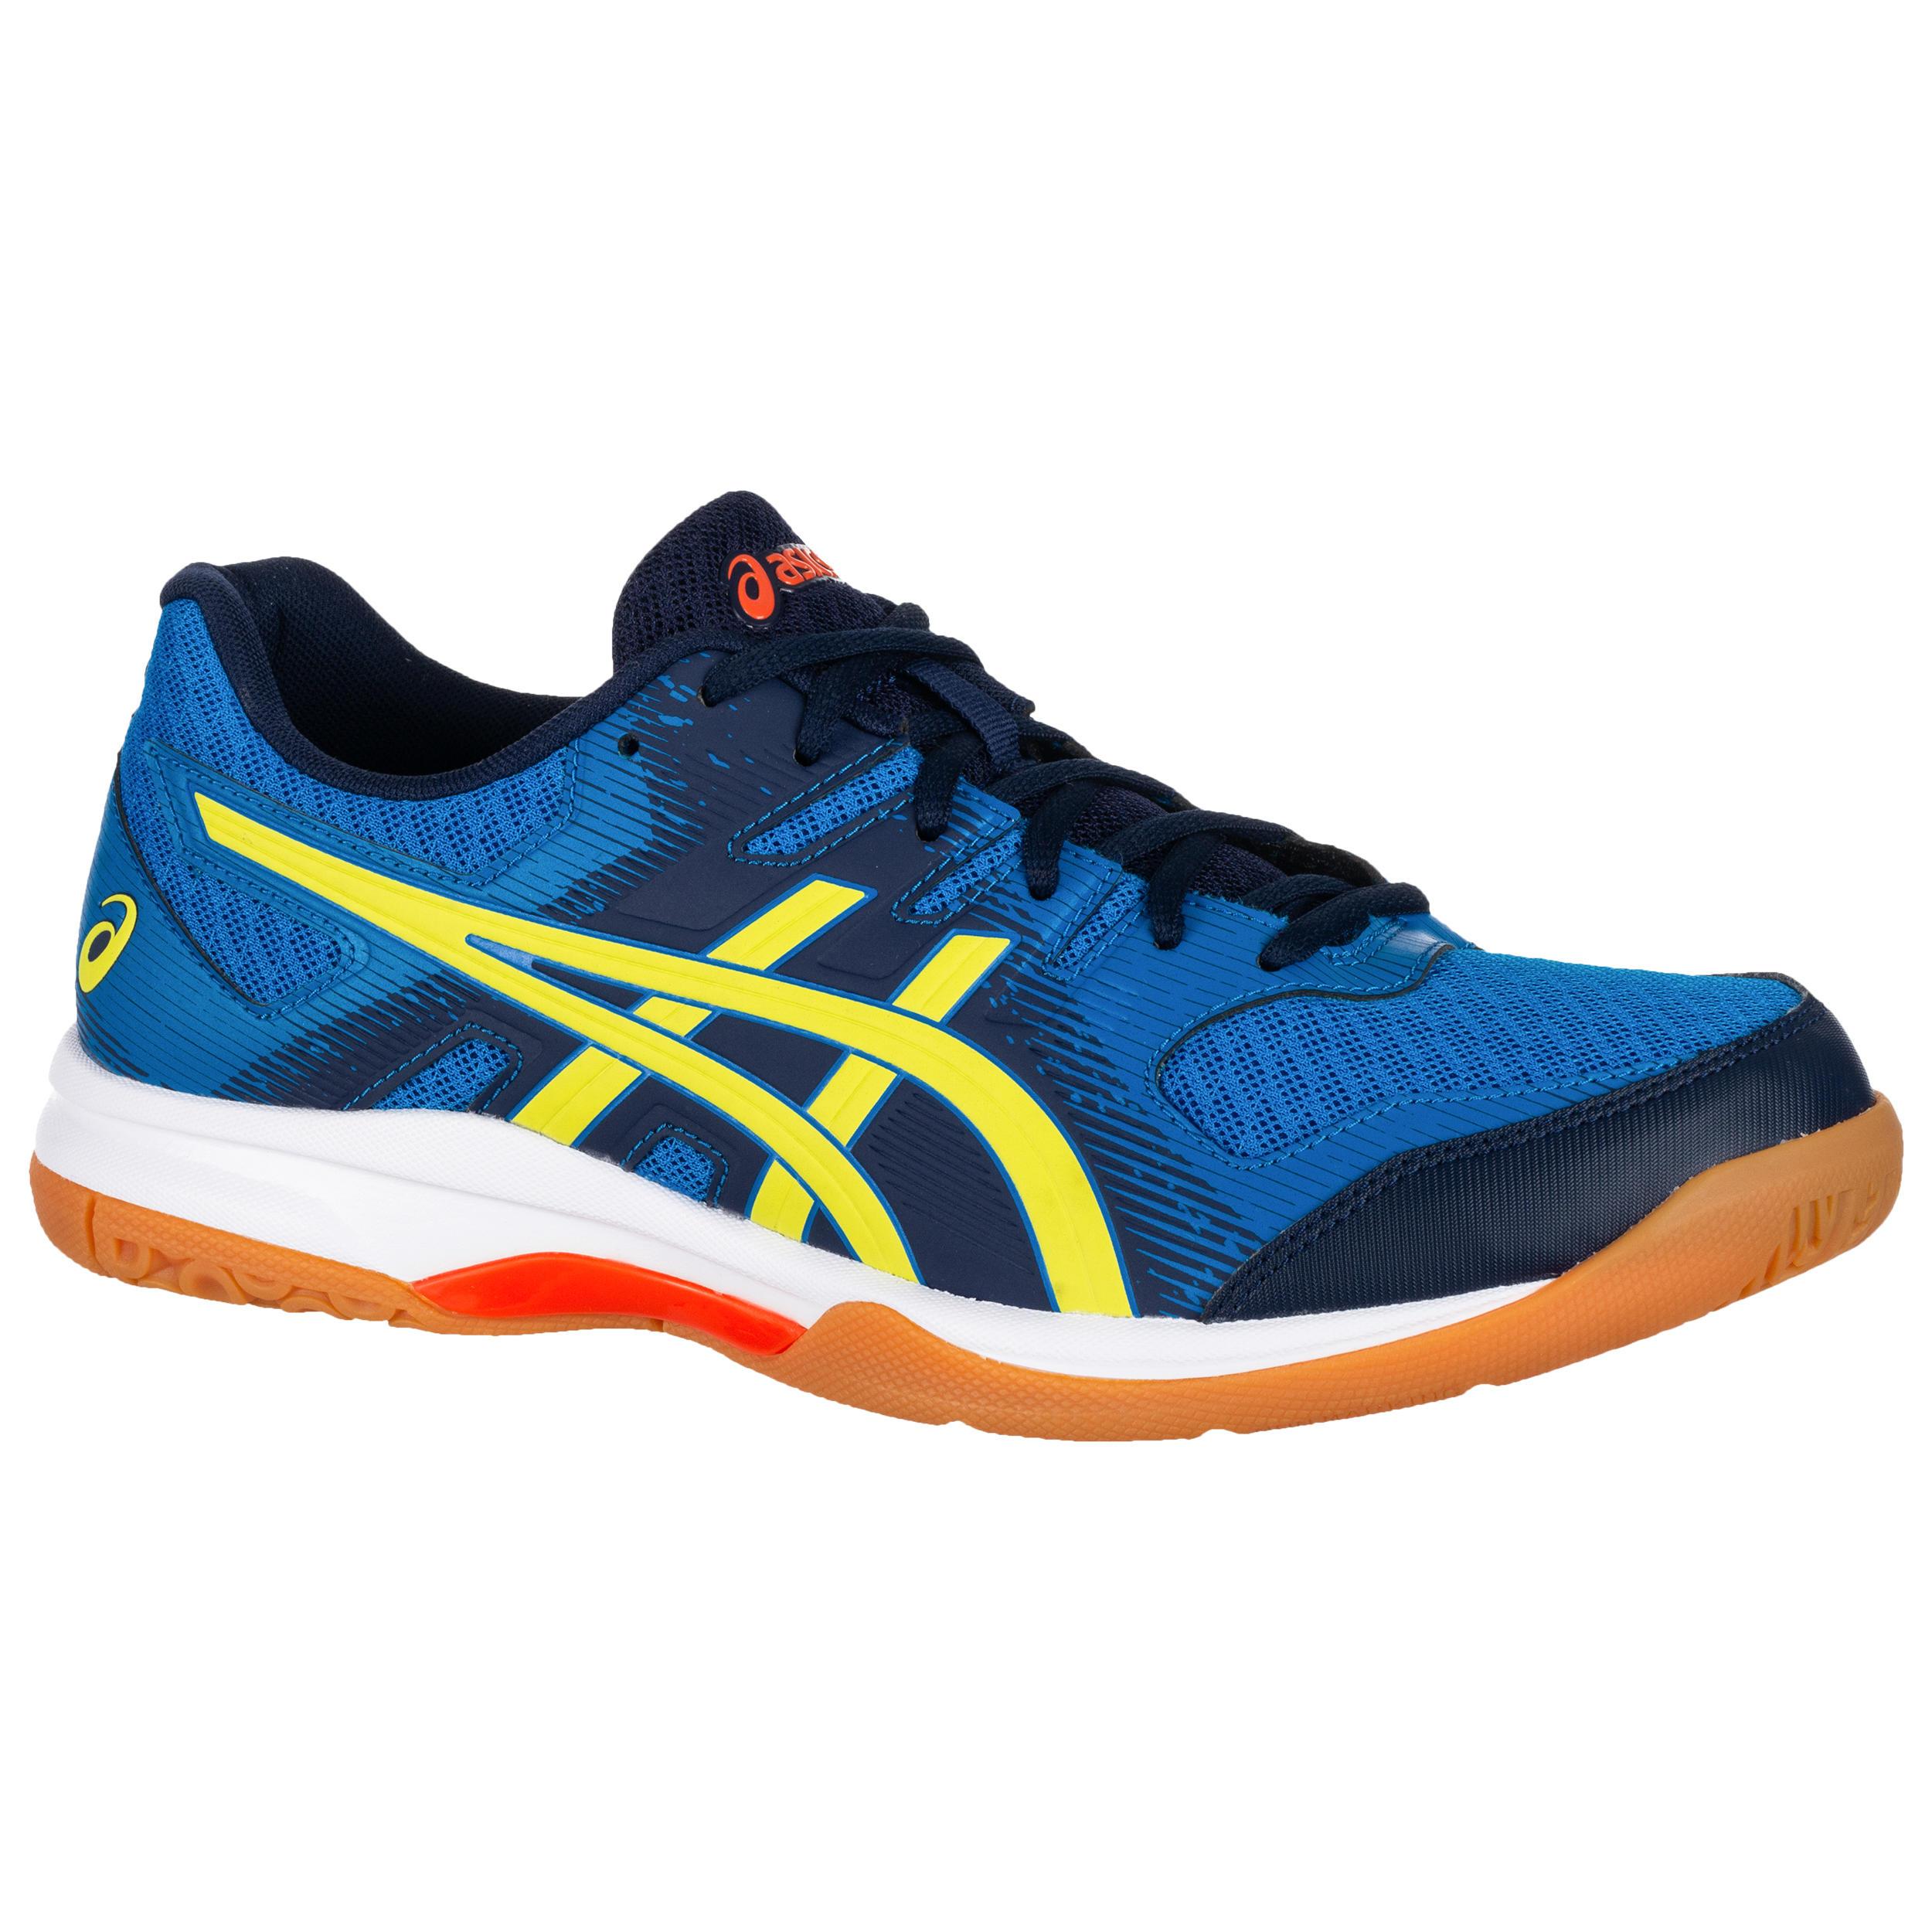 low priced 58052 ec5ba Asics | Sport günstig kaufen | DECATHLON